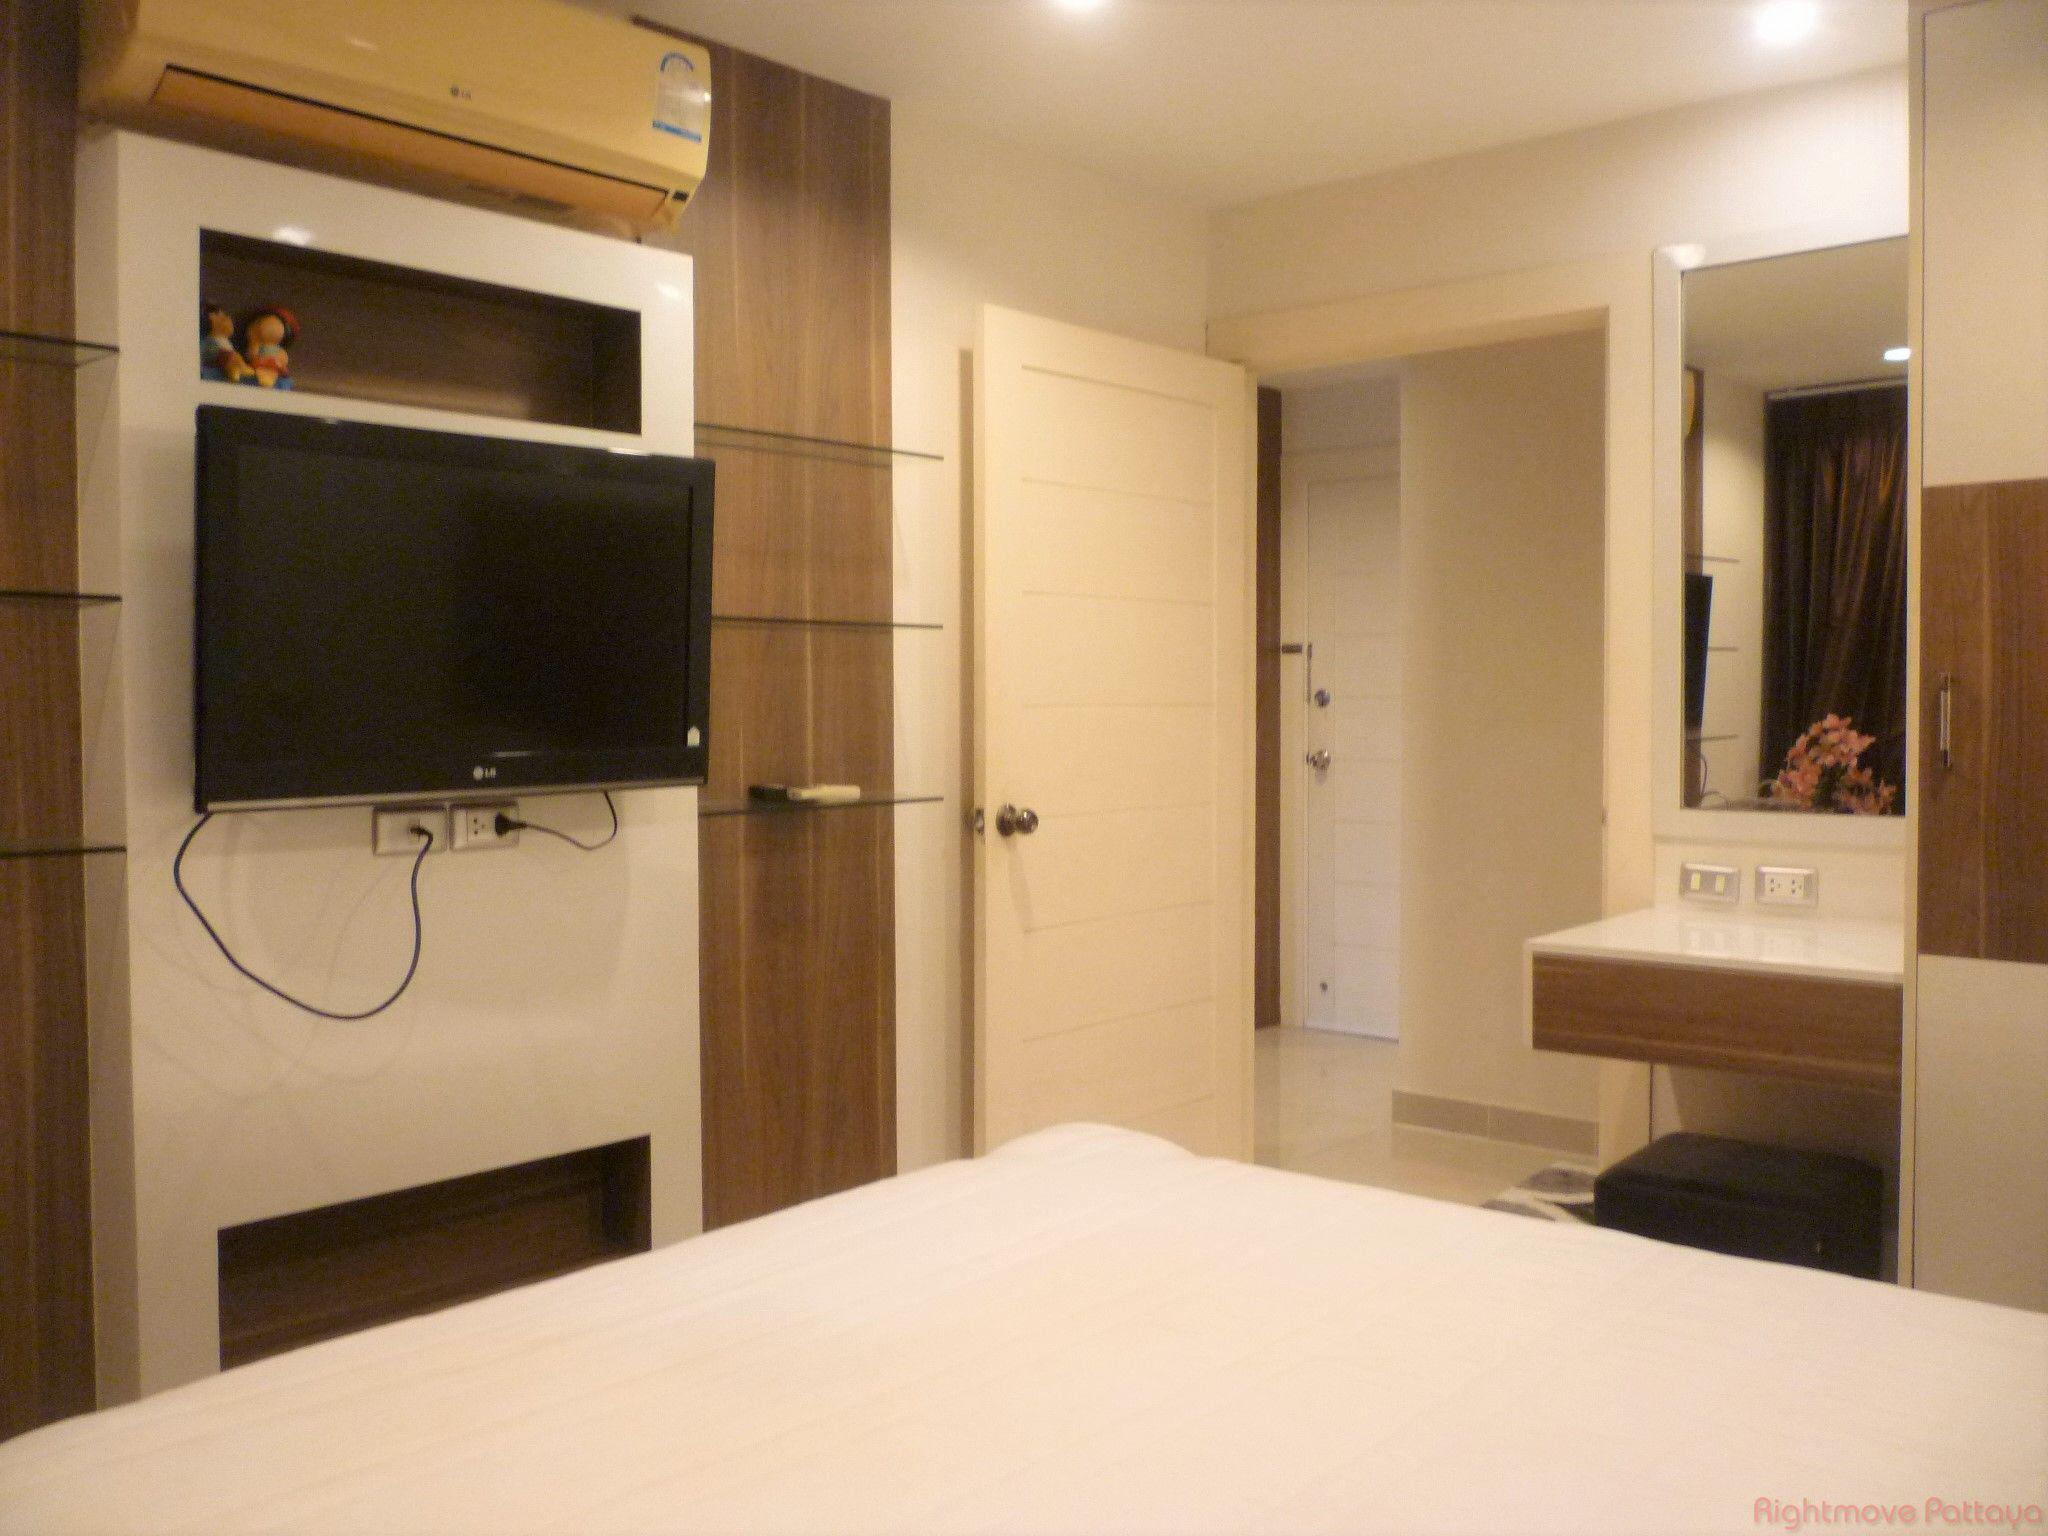 pic-8-Rightmove Pattaya Porchland 2 Jomtien Resort Condominiums for sale in Jomtien Pattaya